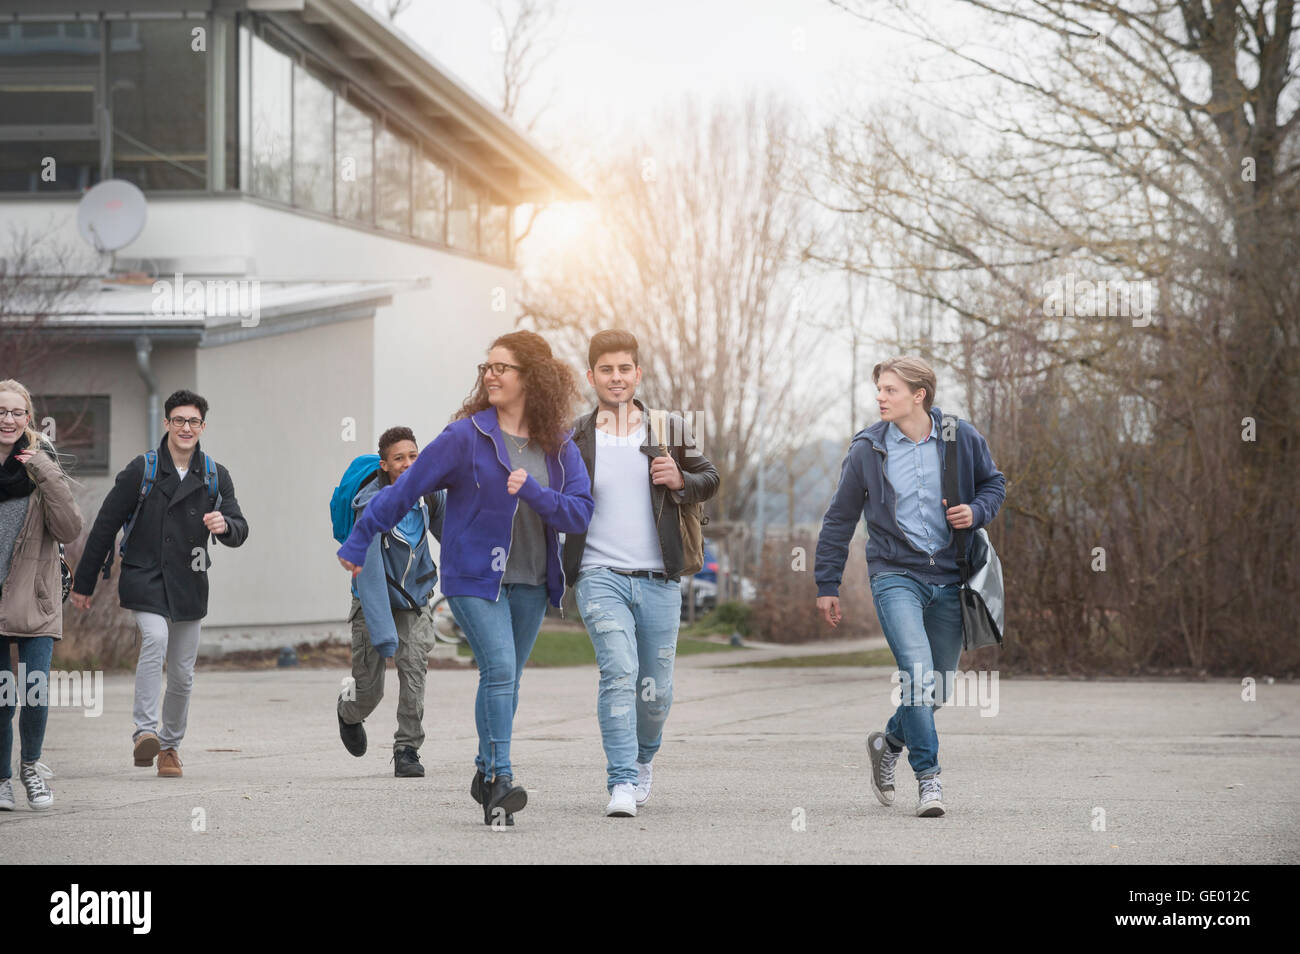 University students leaving school building, Bavaria, Germany - Stock Image